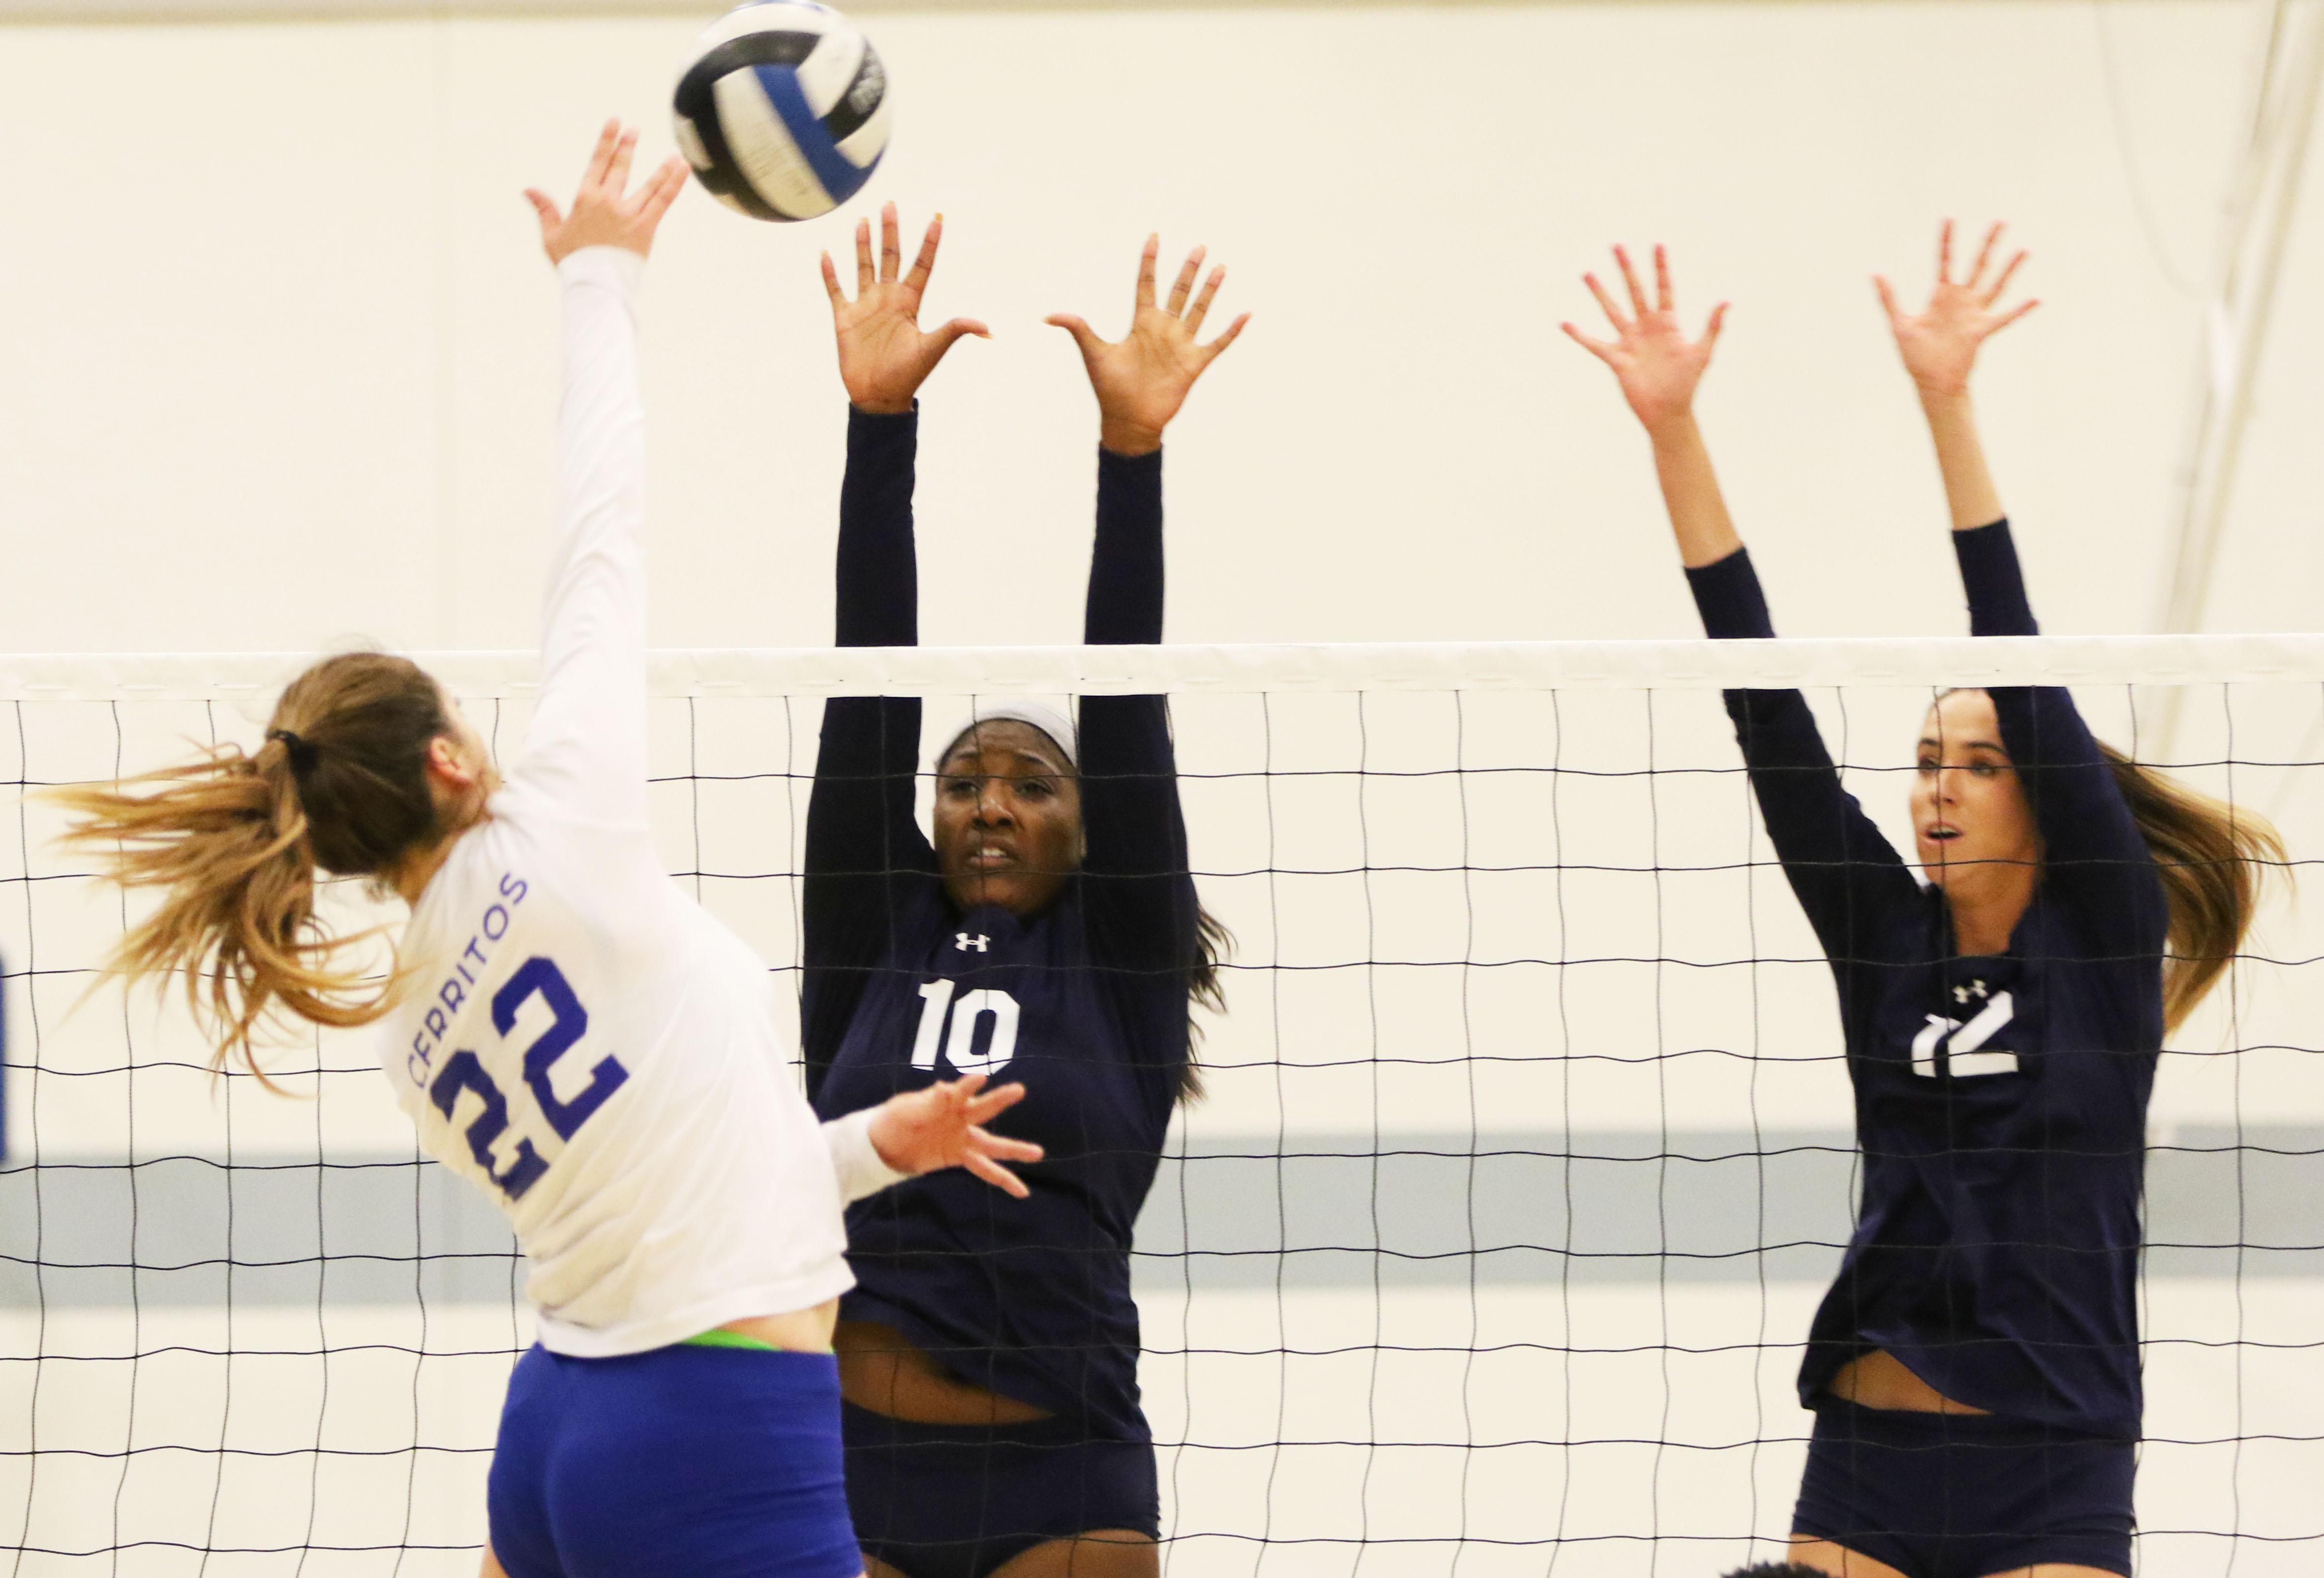 Sophomore Leads El Camino Women S Volleyball Team In Reverse Sweep Over Cerritos College El Camino College The Union